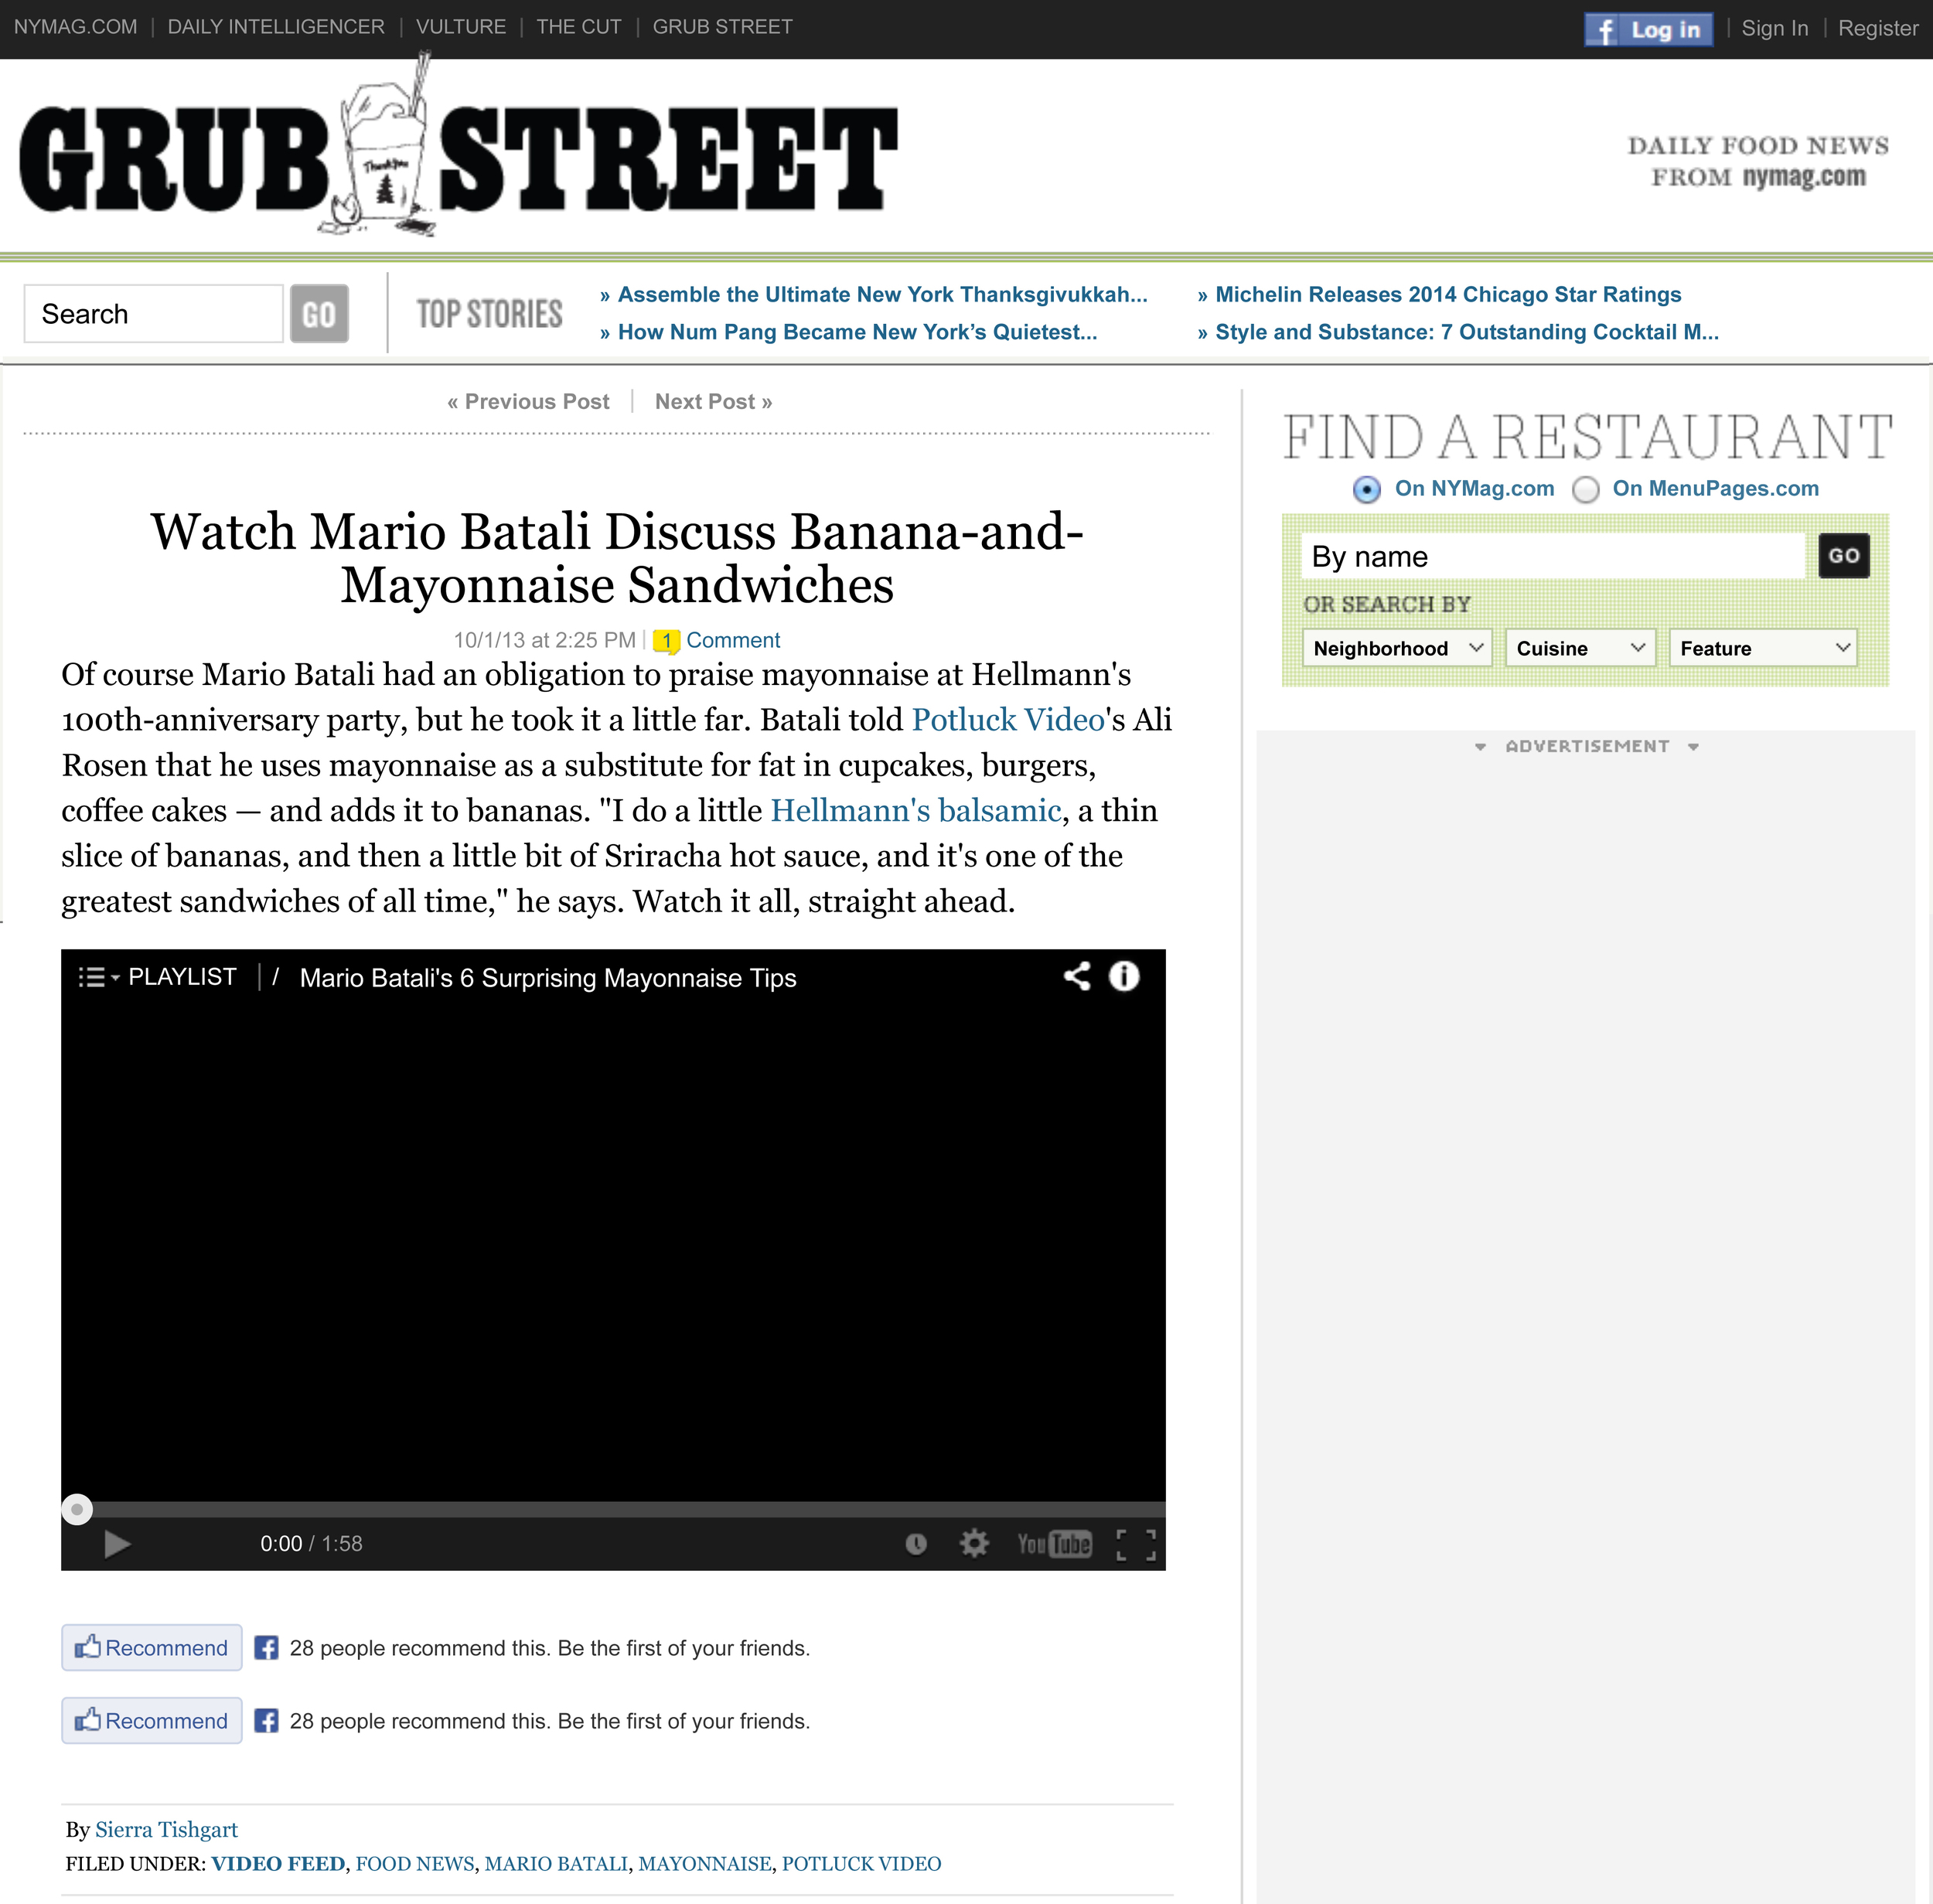 grub-st-Watch-Mario-Batali-Discuss-Banana-and-Mayonnaise-Sandwiches----Grub-Street-New-York-1.jpg